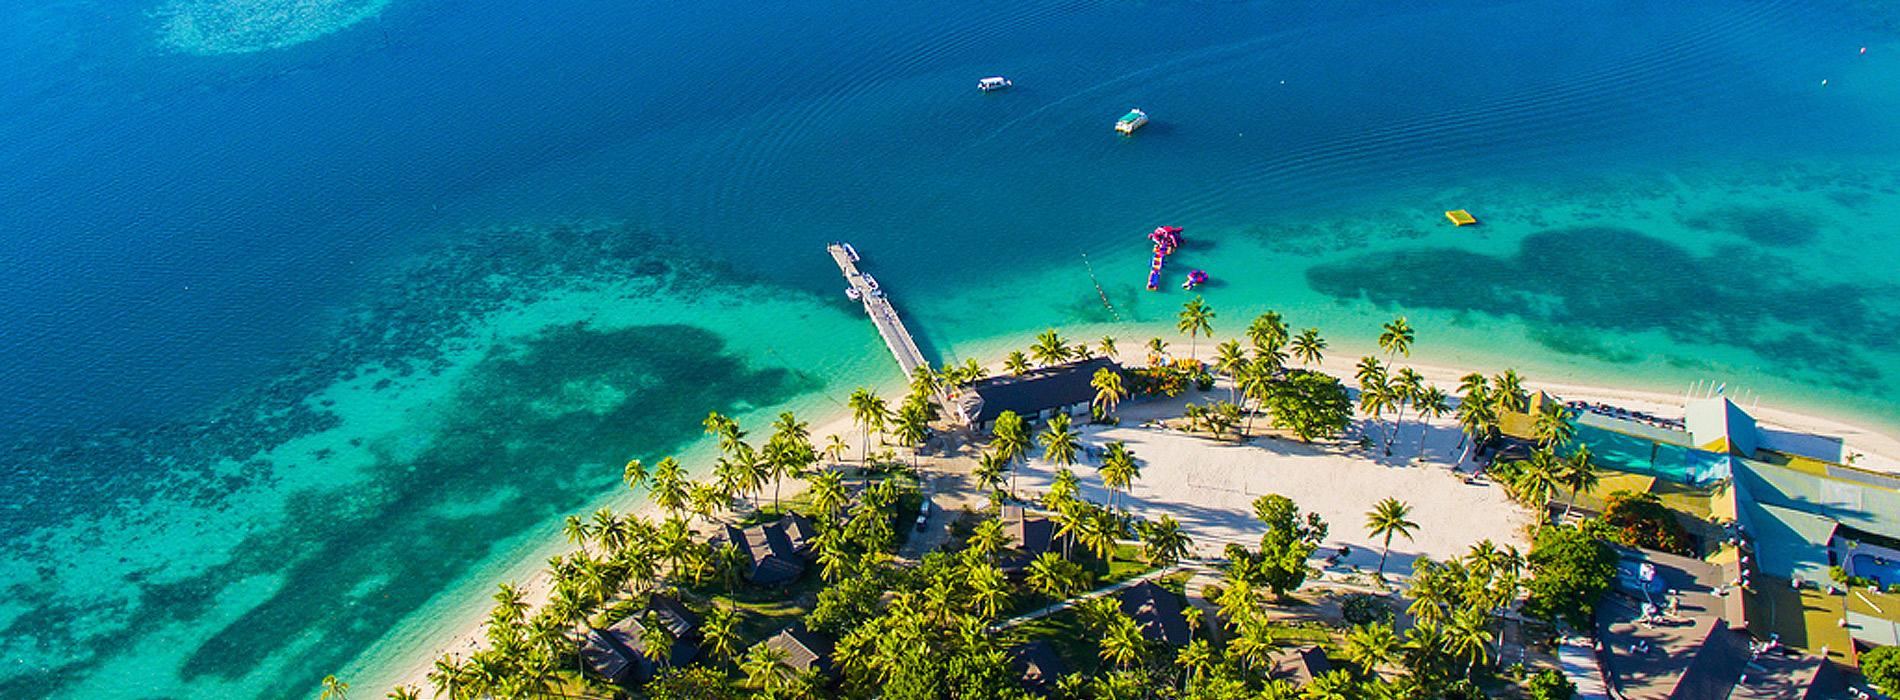 plantation island resort review fiji